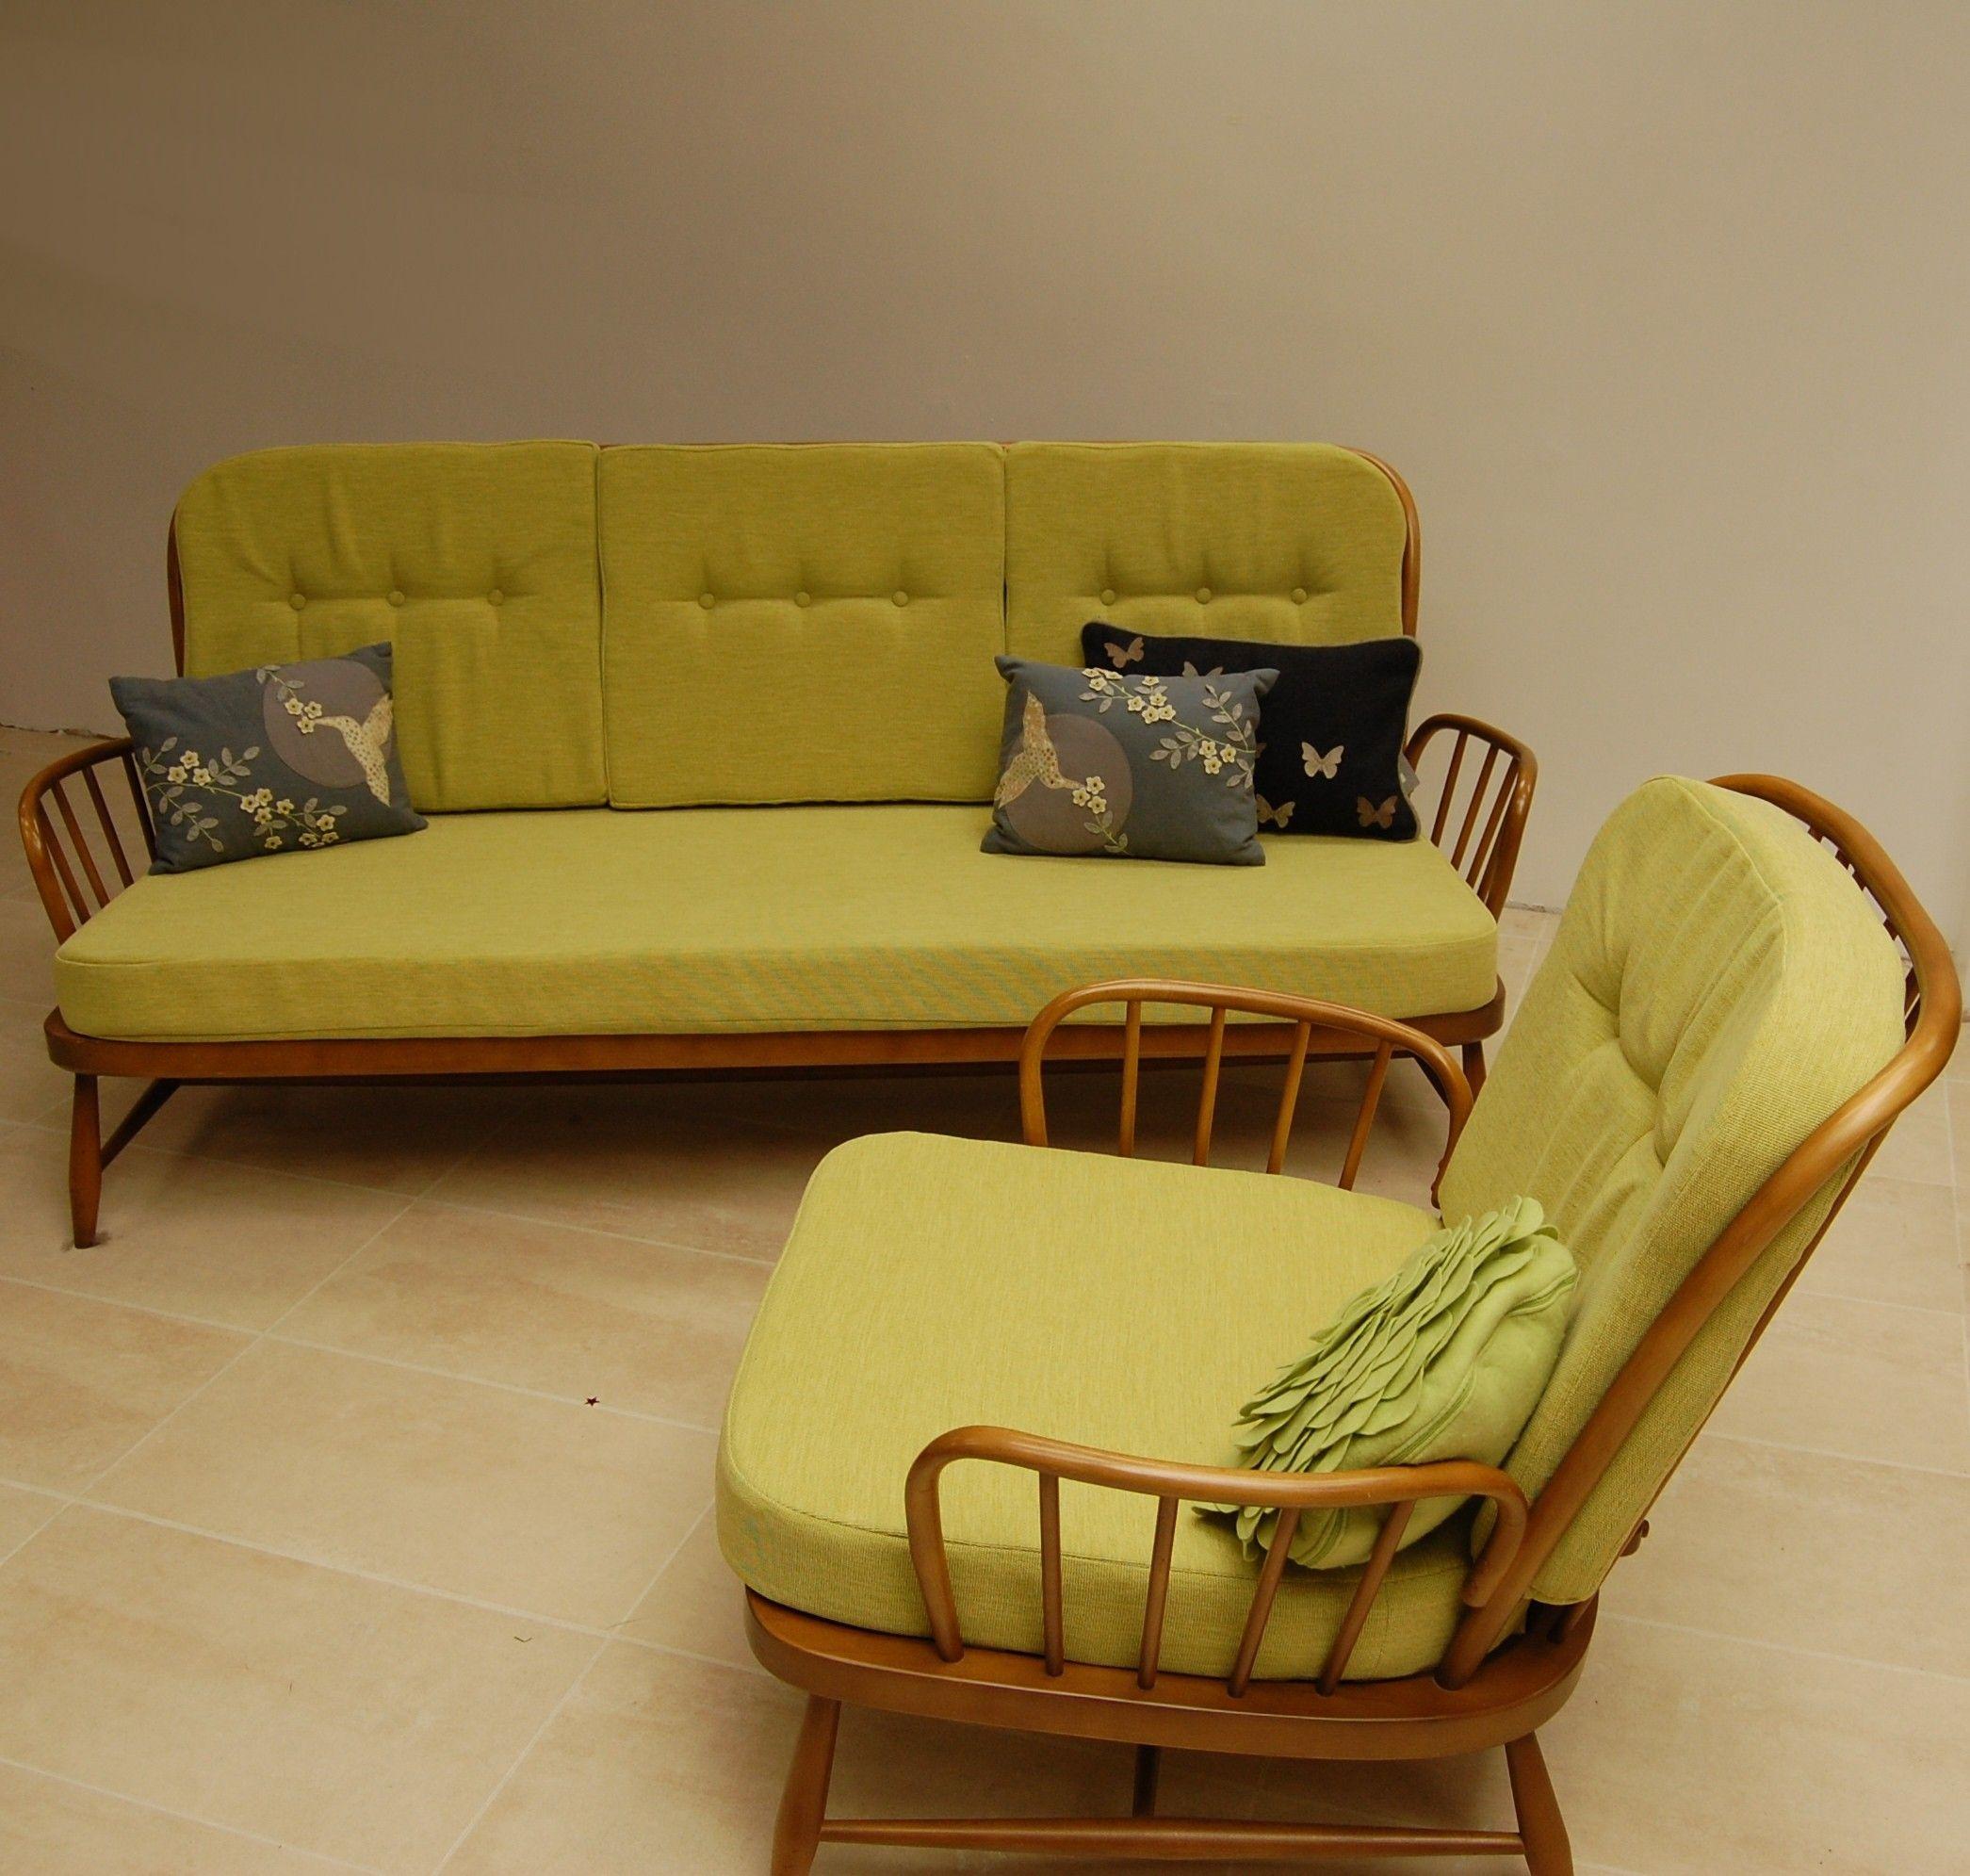 Ercol Tub Sofa 8 Jpg 2091 1991 Ercol Furniture Furniture Danish Design Chair